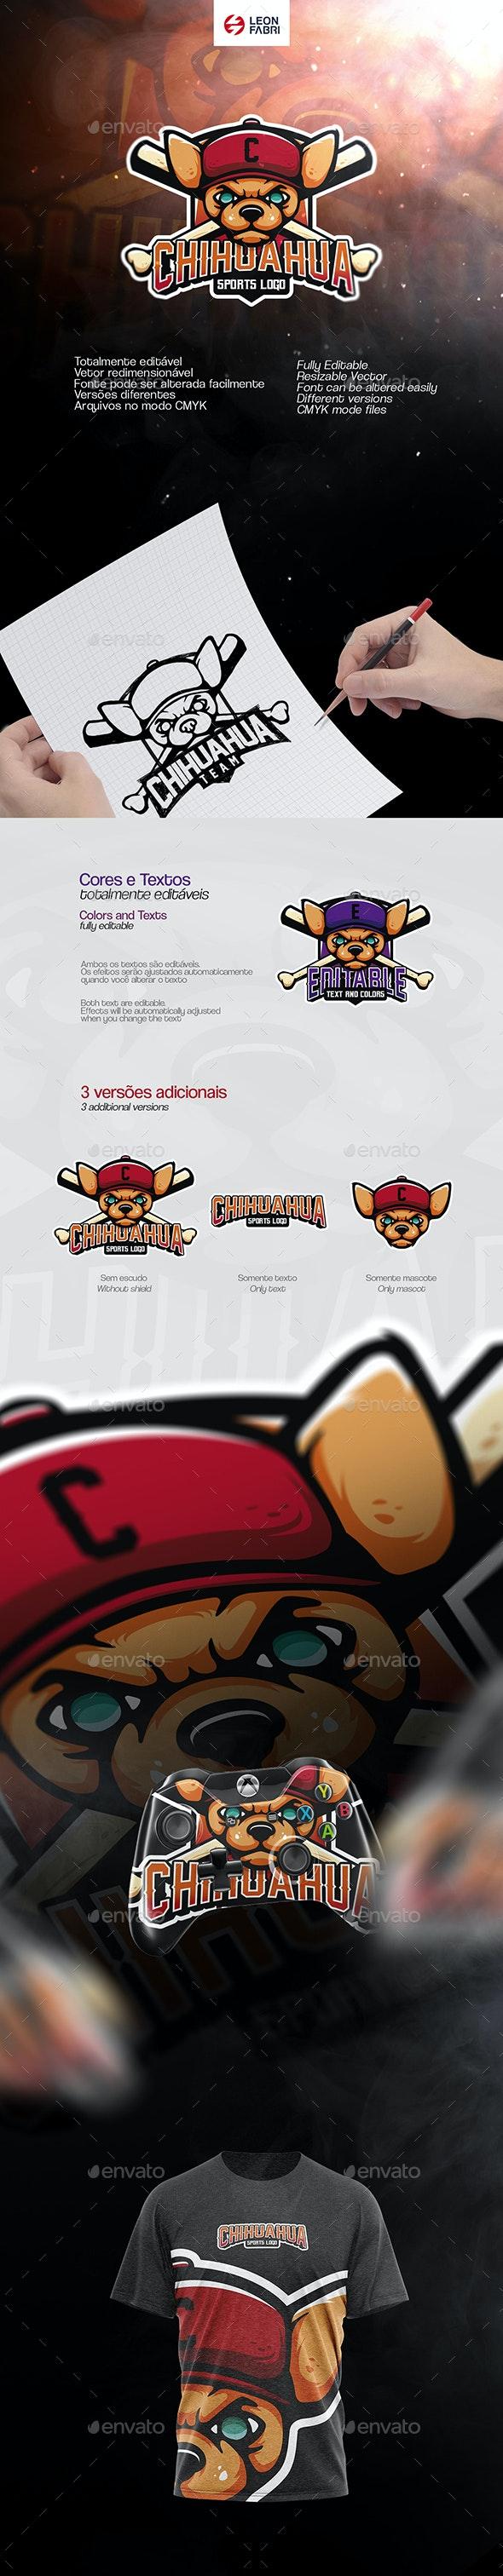 Chihuahua Sports Logo - Sports Logo Templates